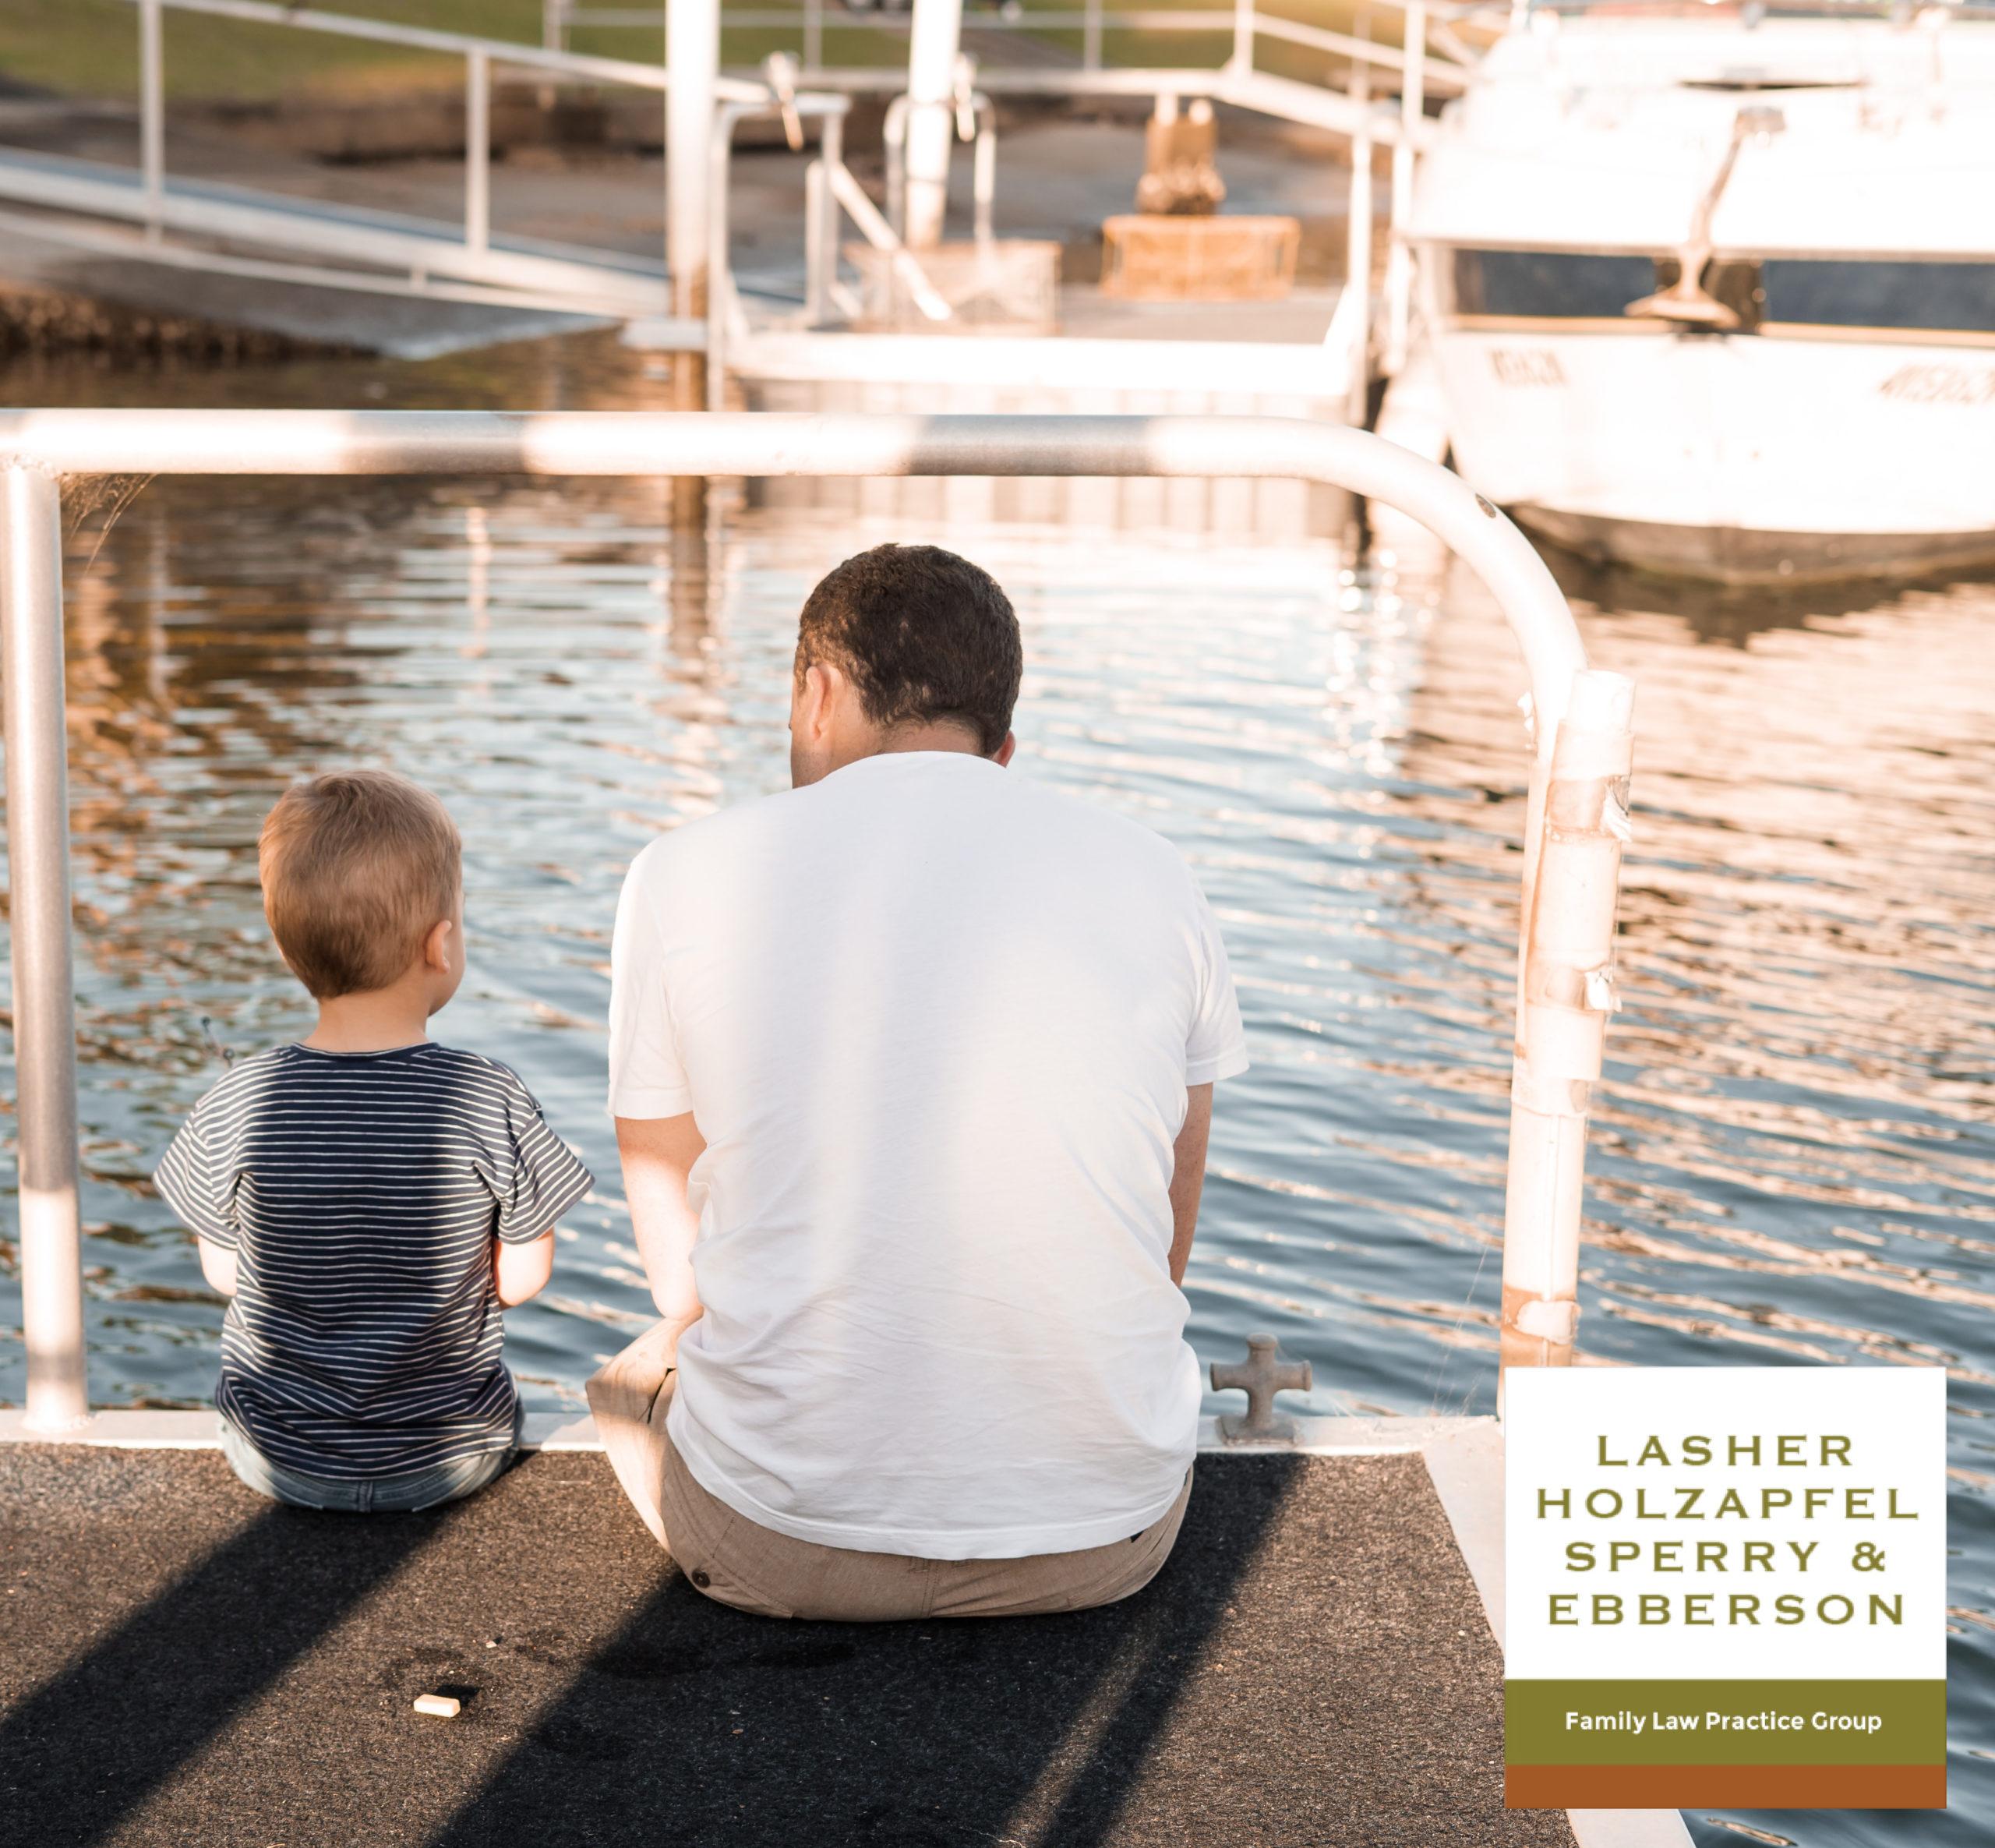 Five Tips to Building a Positive Co-Parent Relationship after Divorce